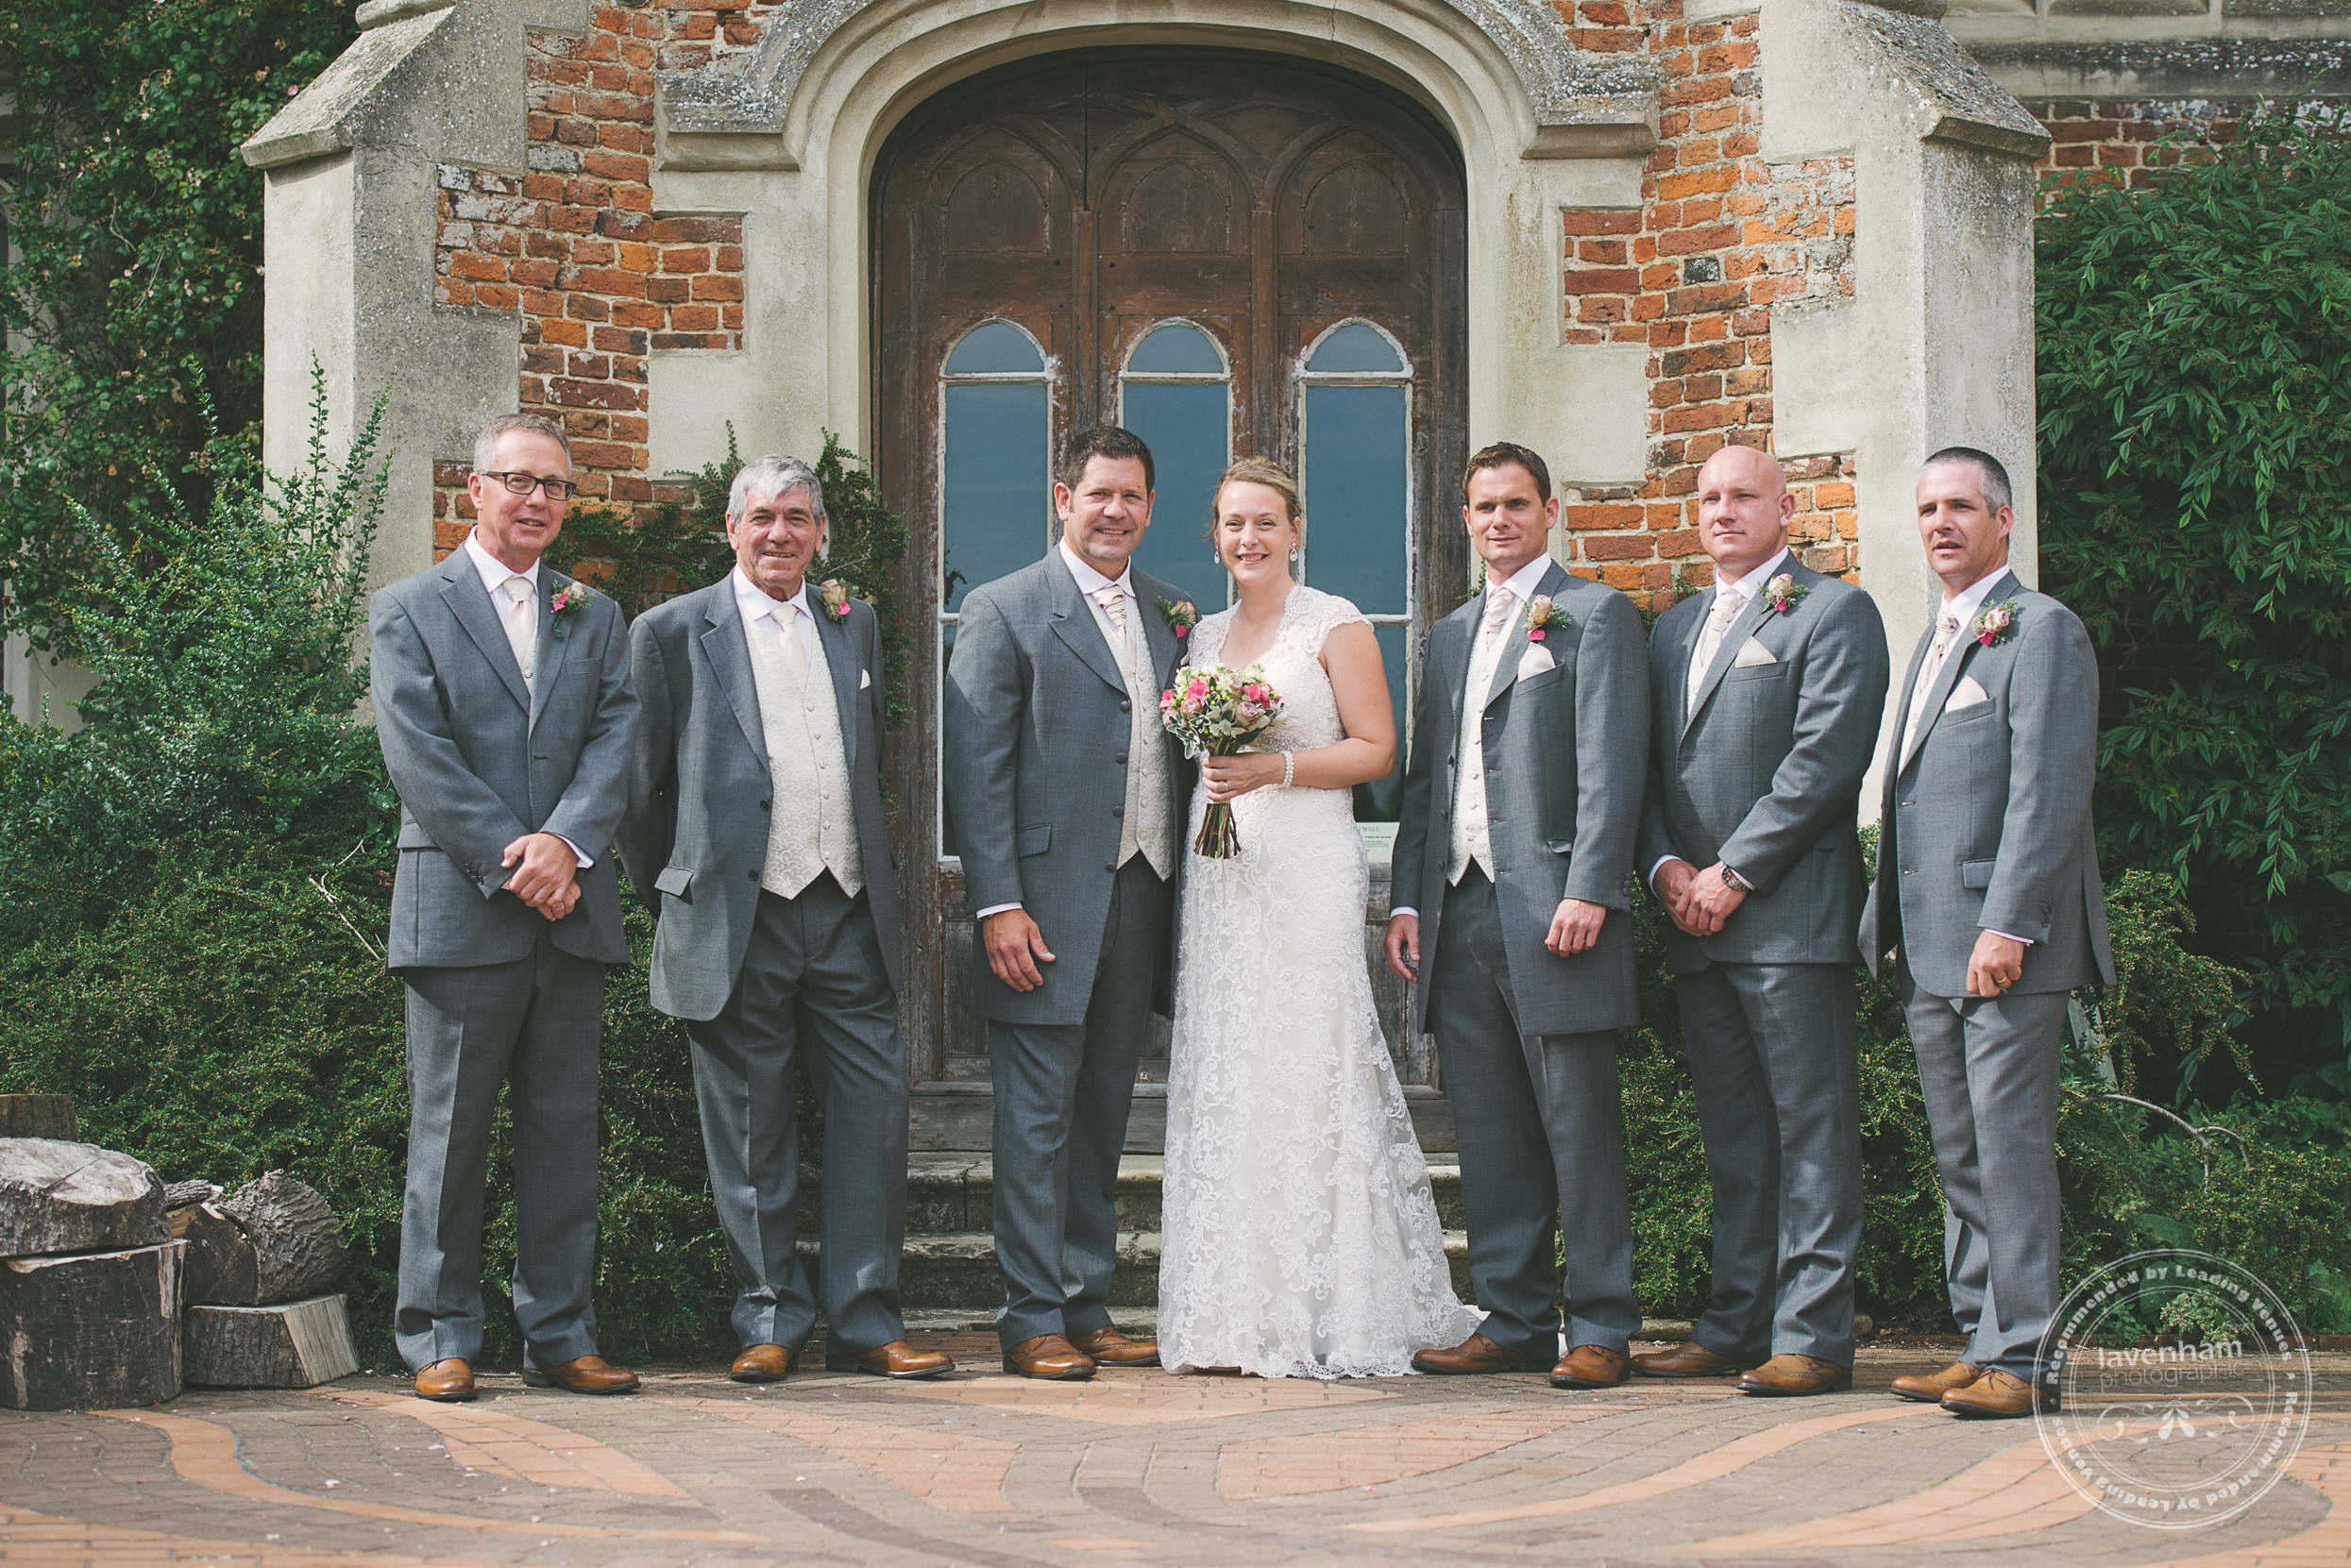 180715-kentwell-hall-wedding-photographer-016